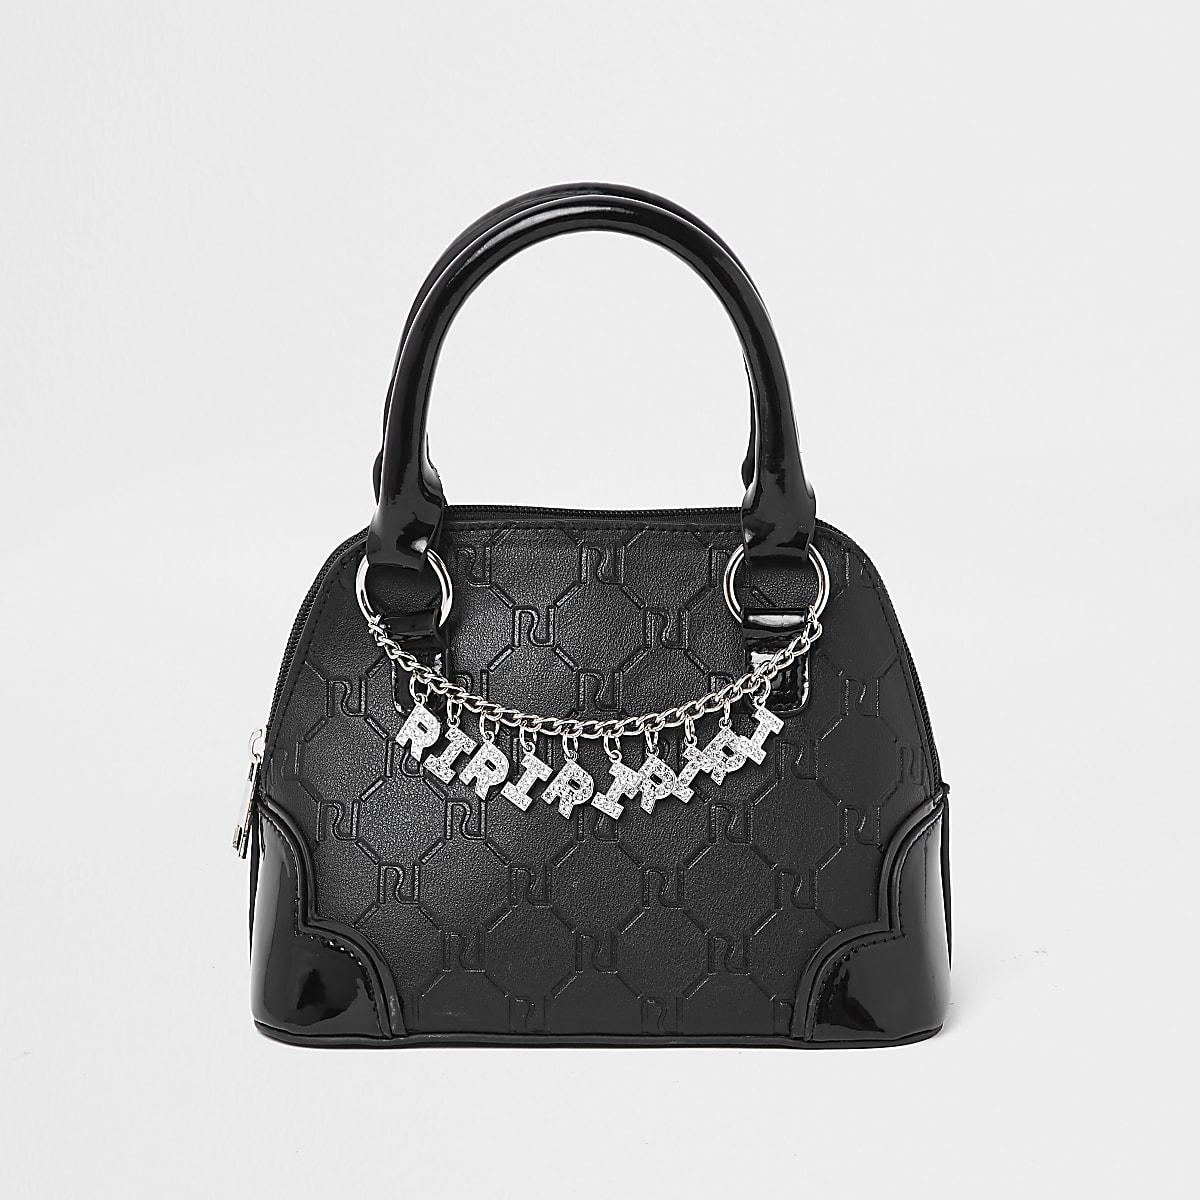 Girls black RI monogram chain tote bag